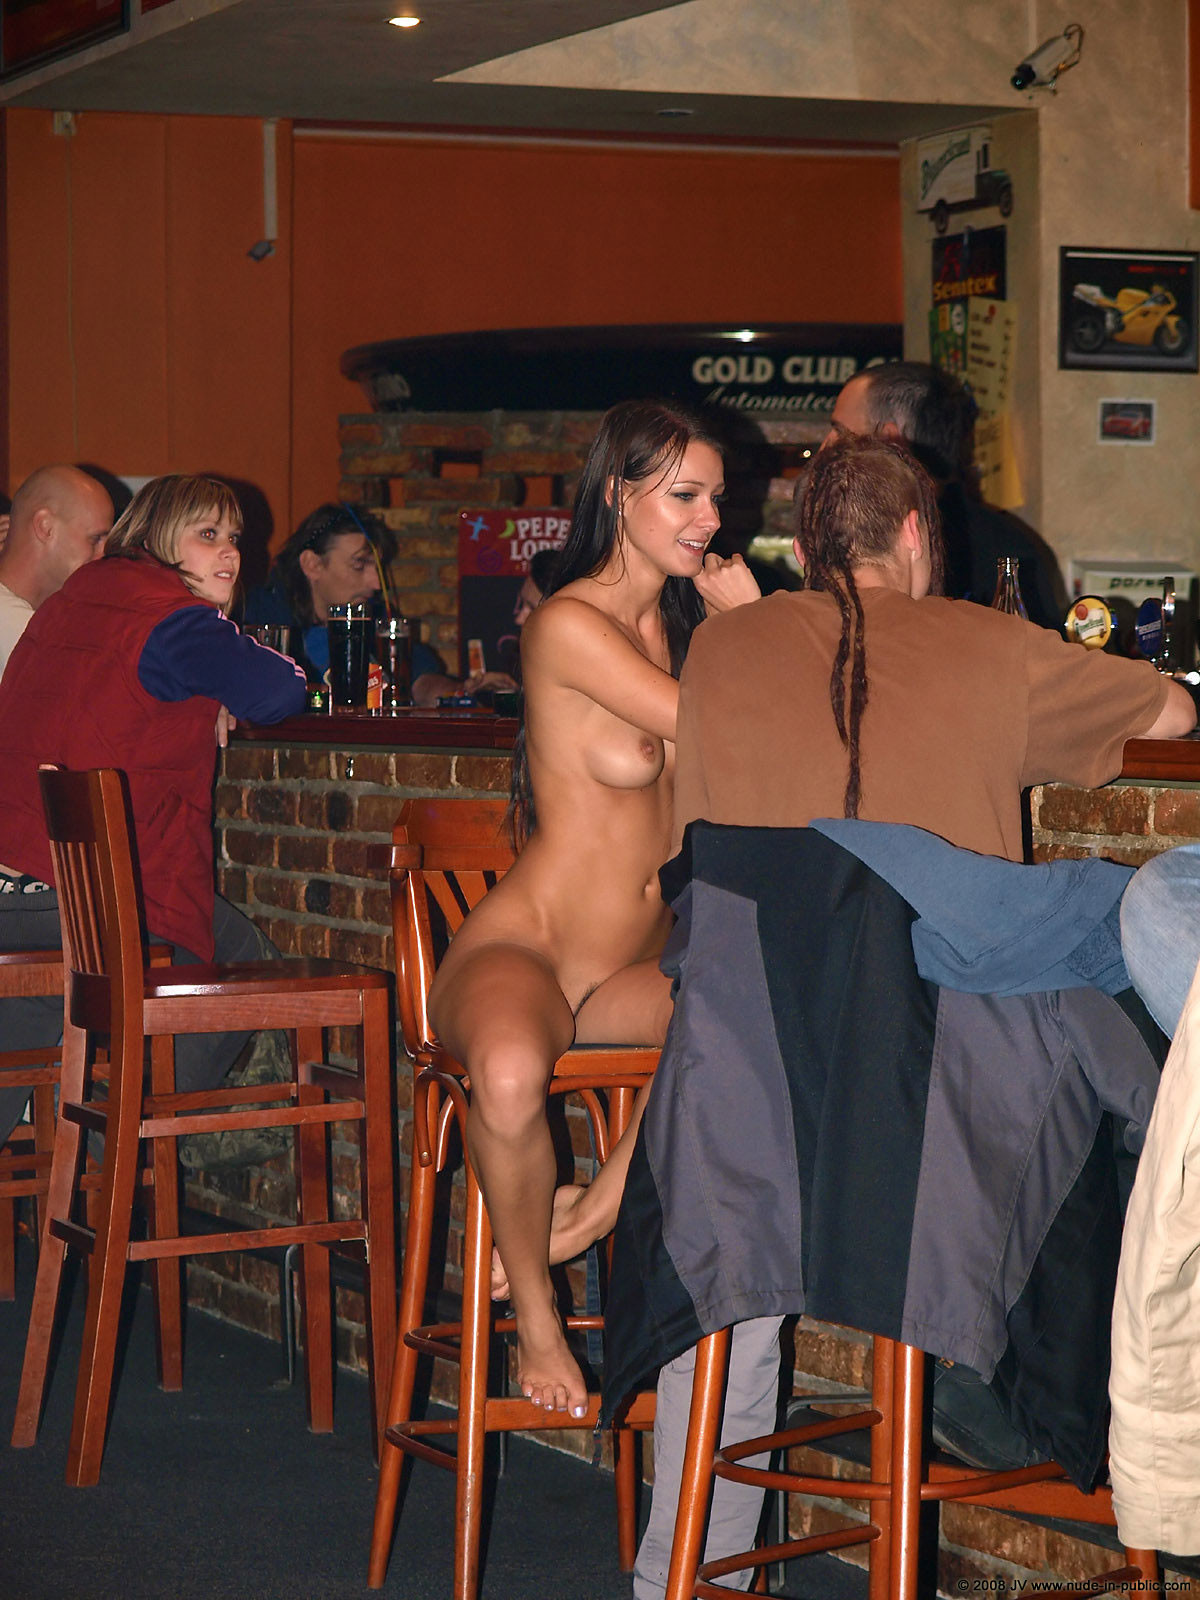 melisa-pub-beer-bar-girl-nude-in-public-89